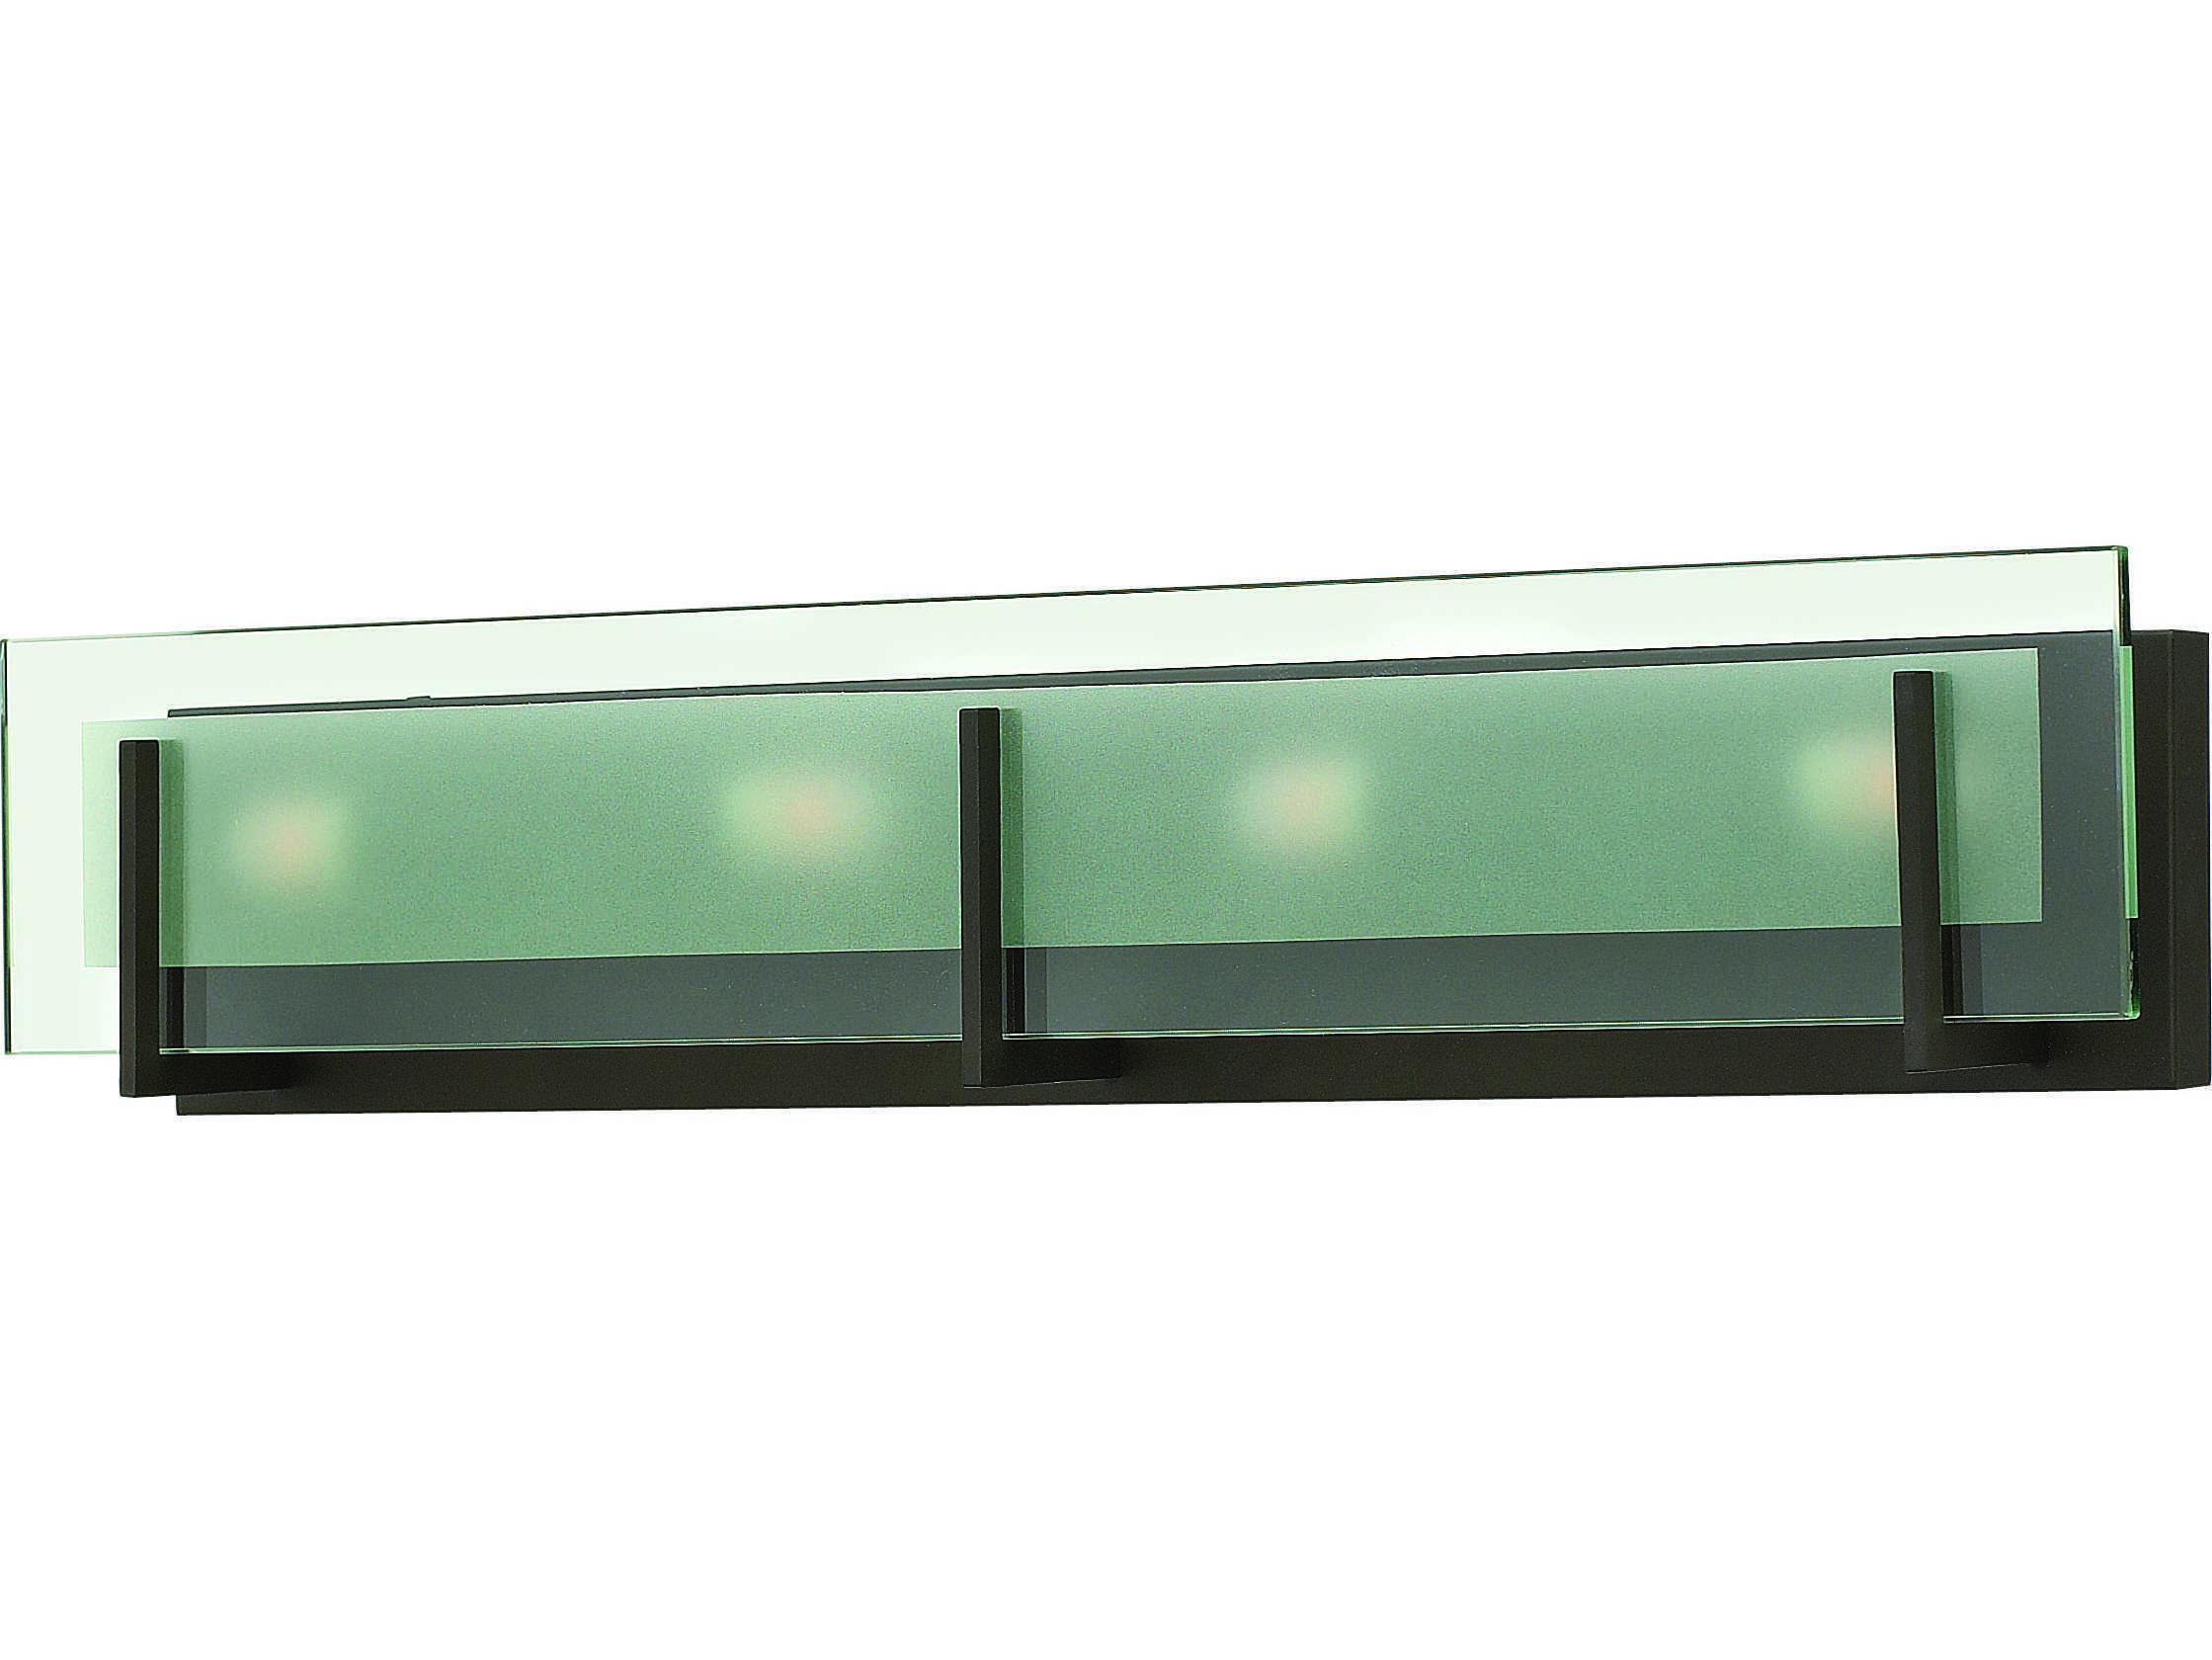 Vanity Light Bar Cover - Home & Furniture Design - Kitchenagenda.com